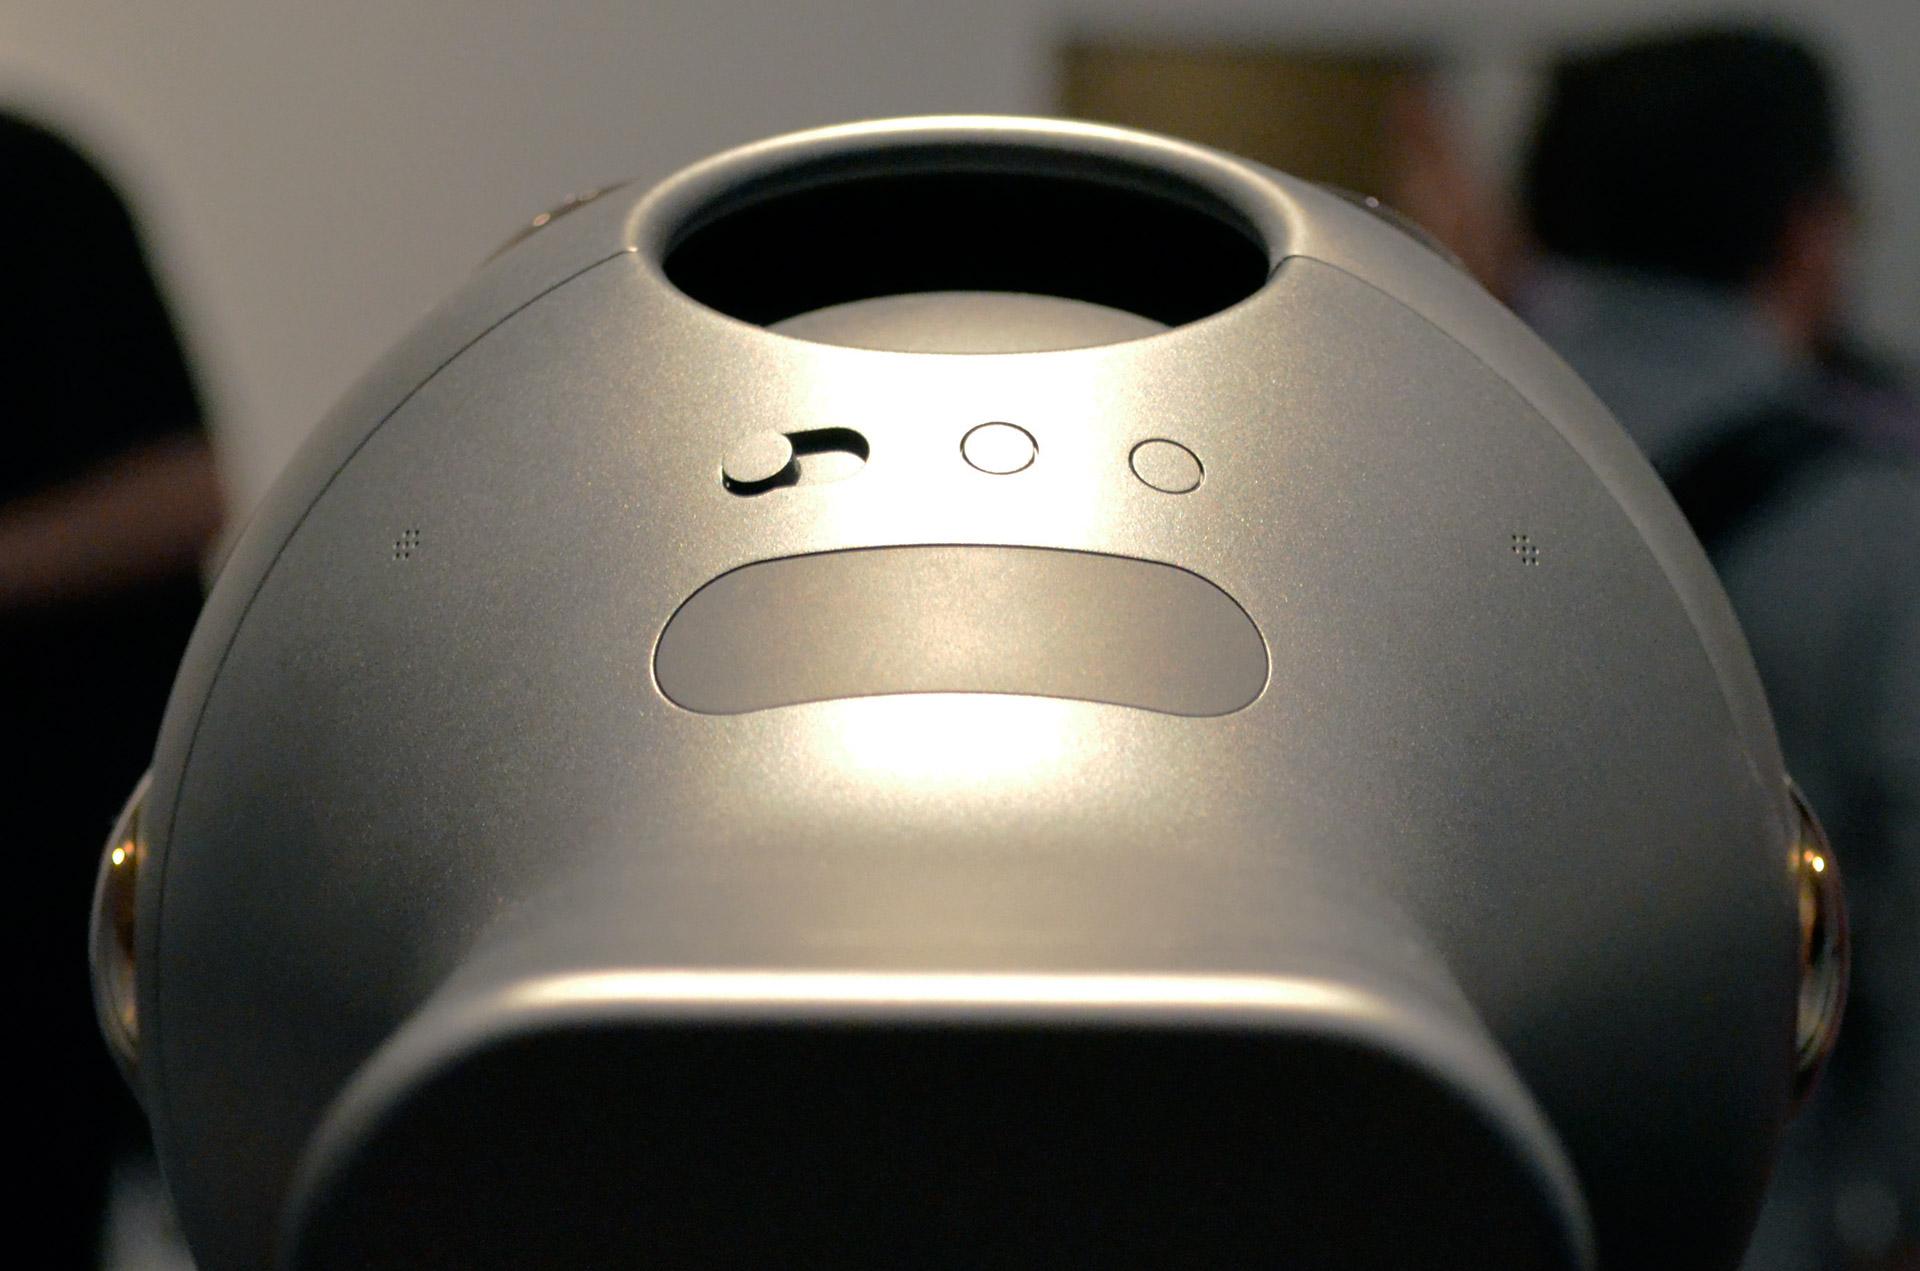 nokia ozo buttons